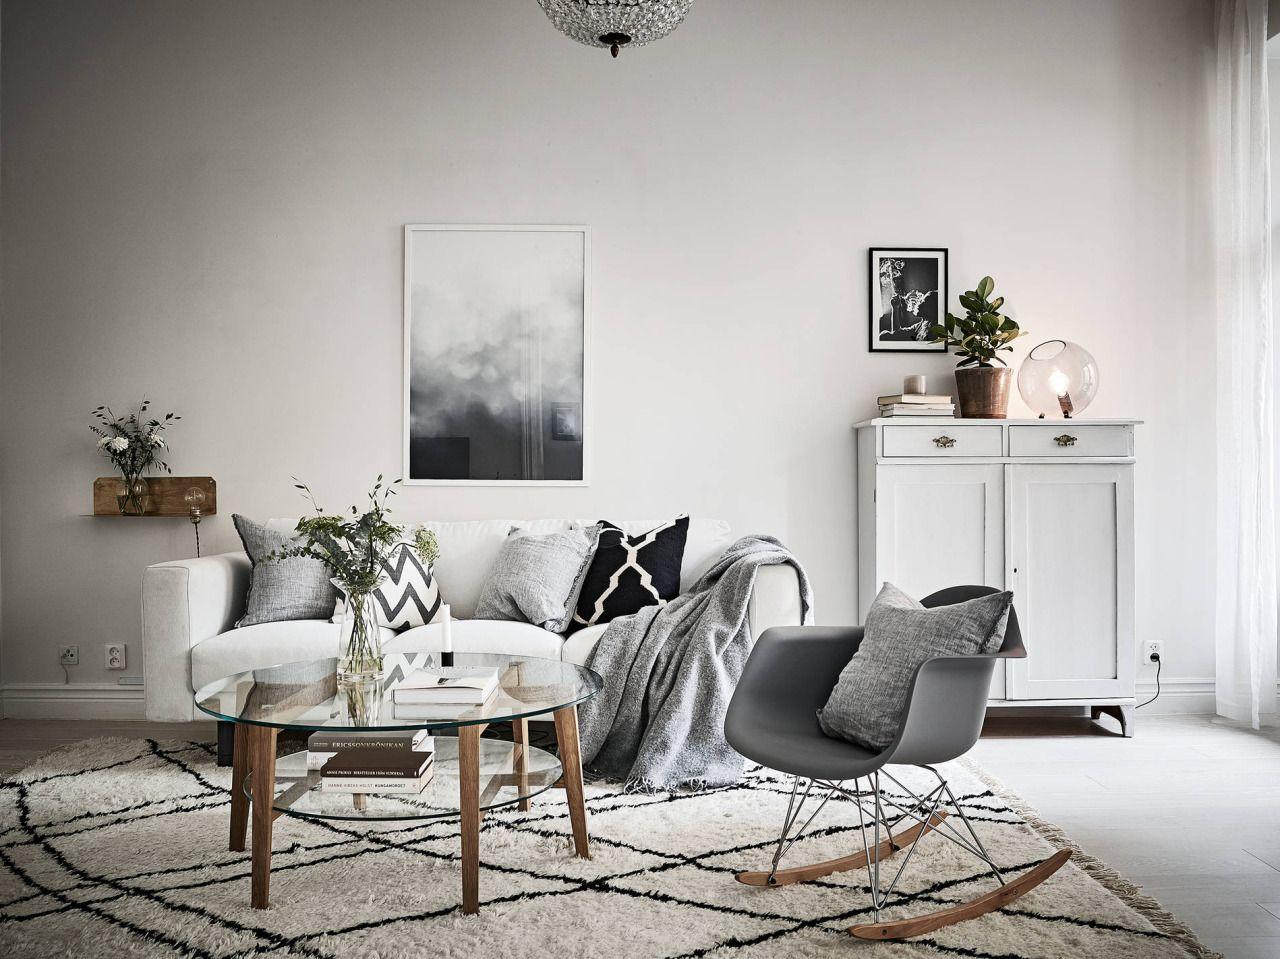 wohnzimmer deko skandinavisch : Scandinavian Living Room Living Room Pinterest Wohnzimmer